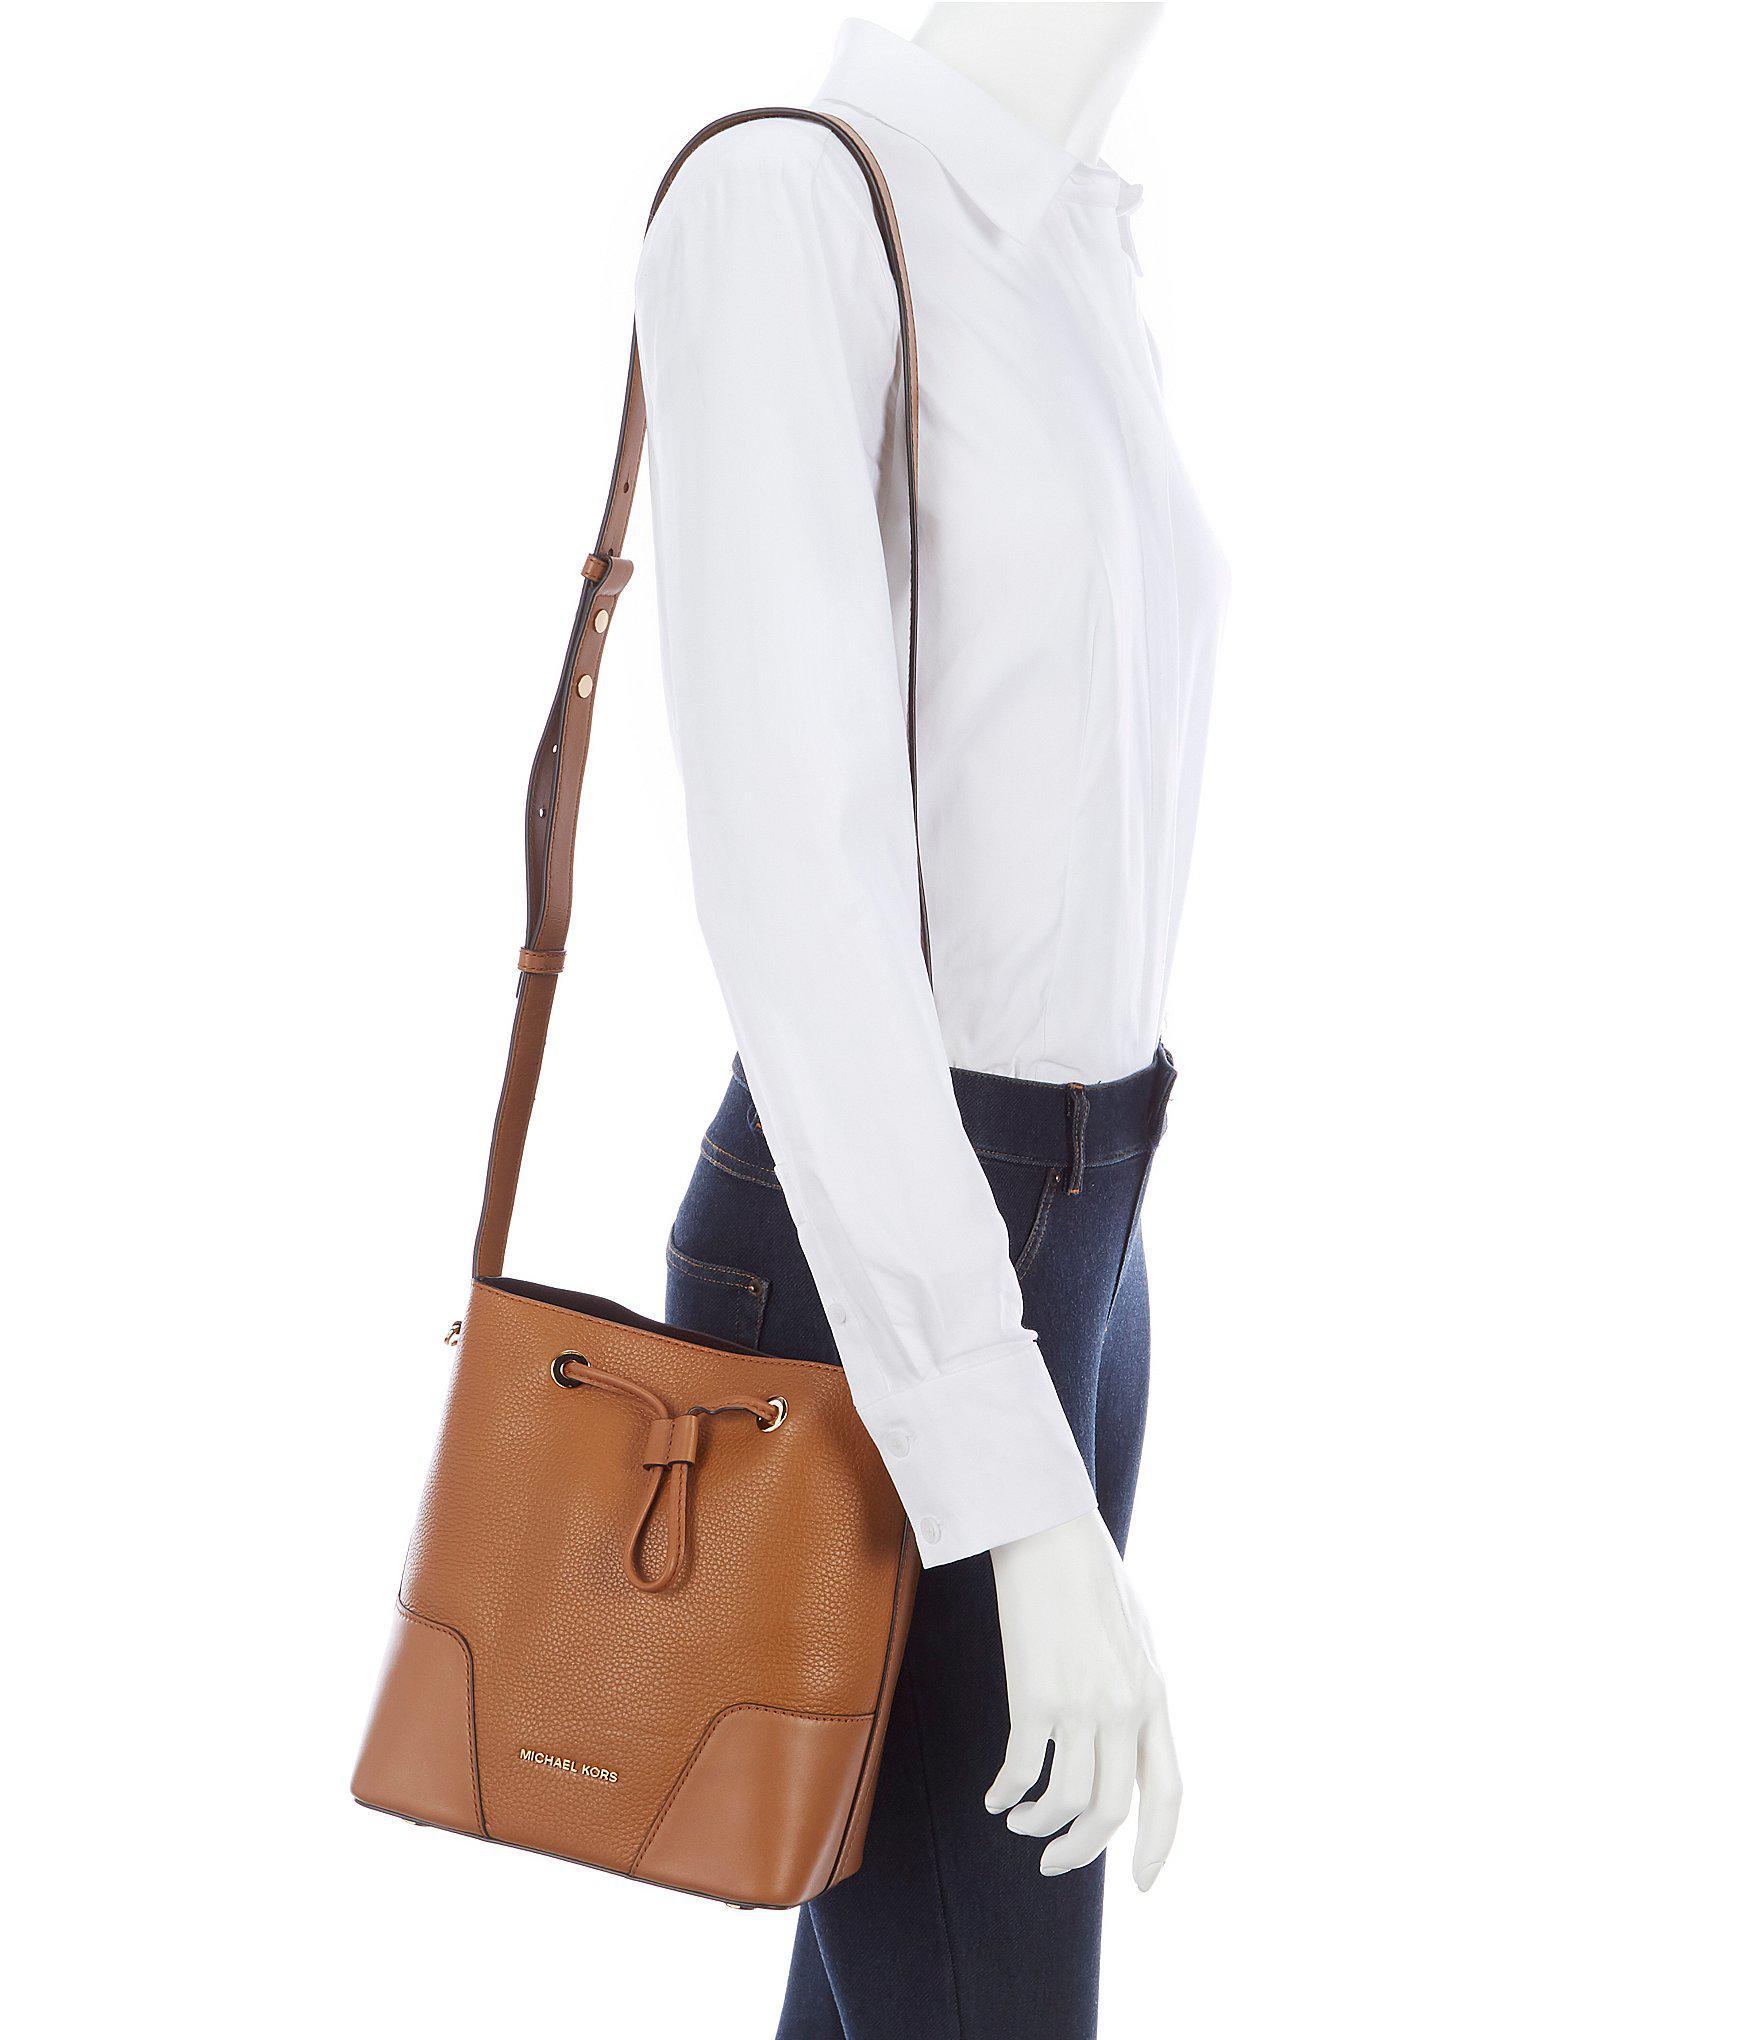 c265c2af316c MICHAEL Michael Kors Cary Small Drawstring Bucket Bag - Lyst